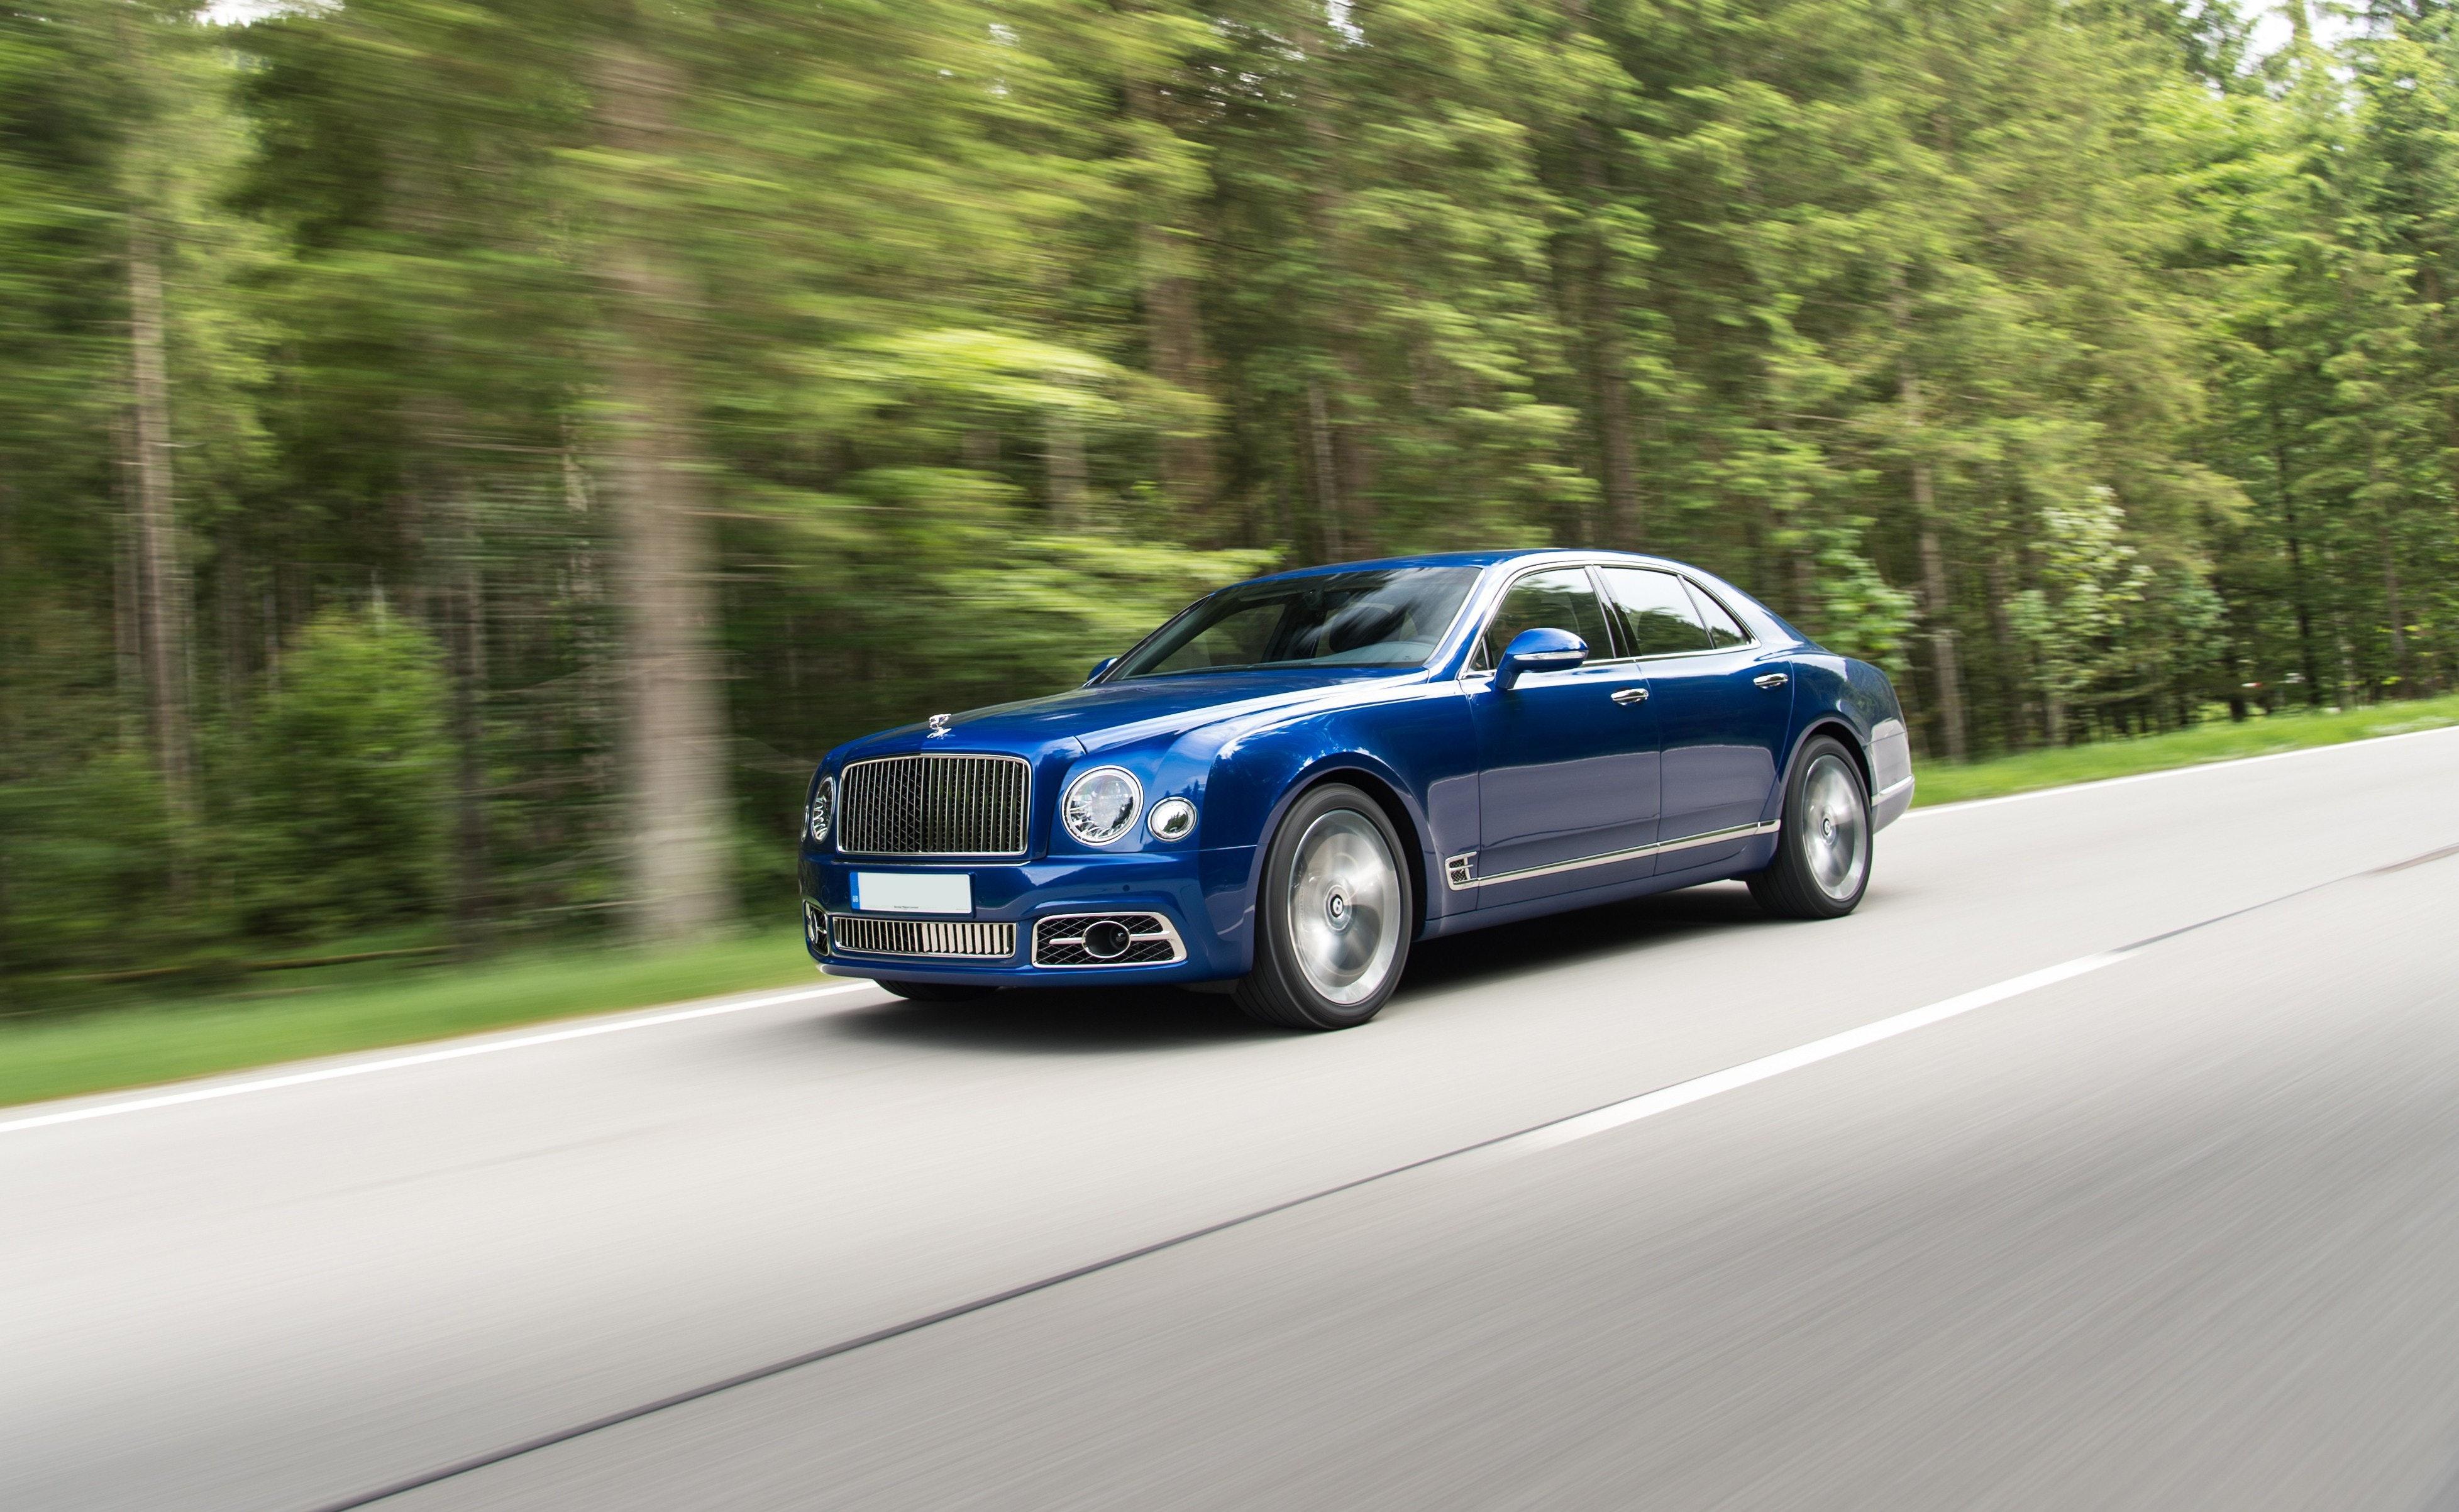 Bentley mulsanne review uk dating